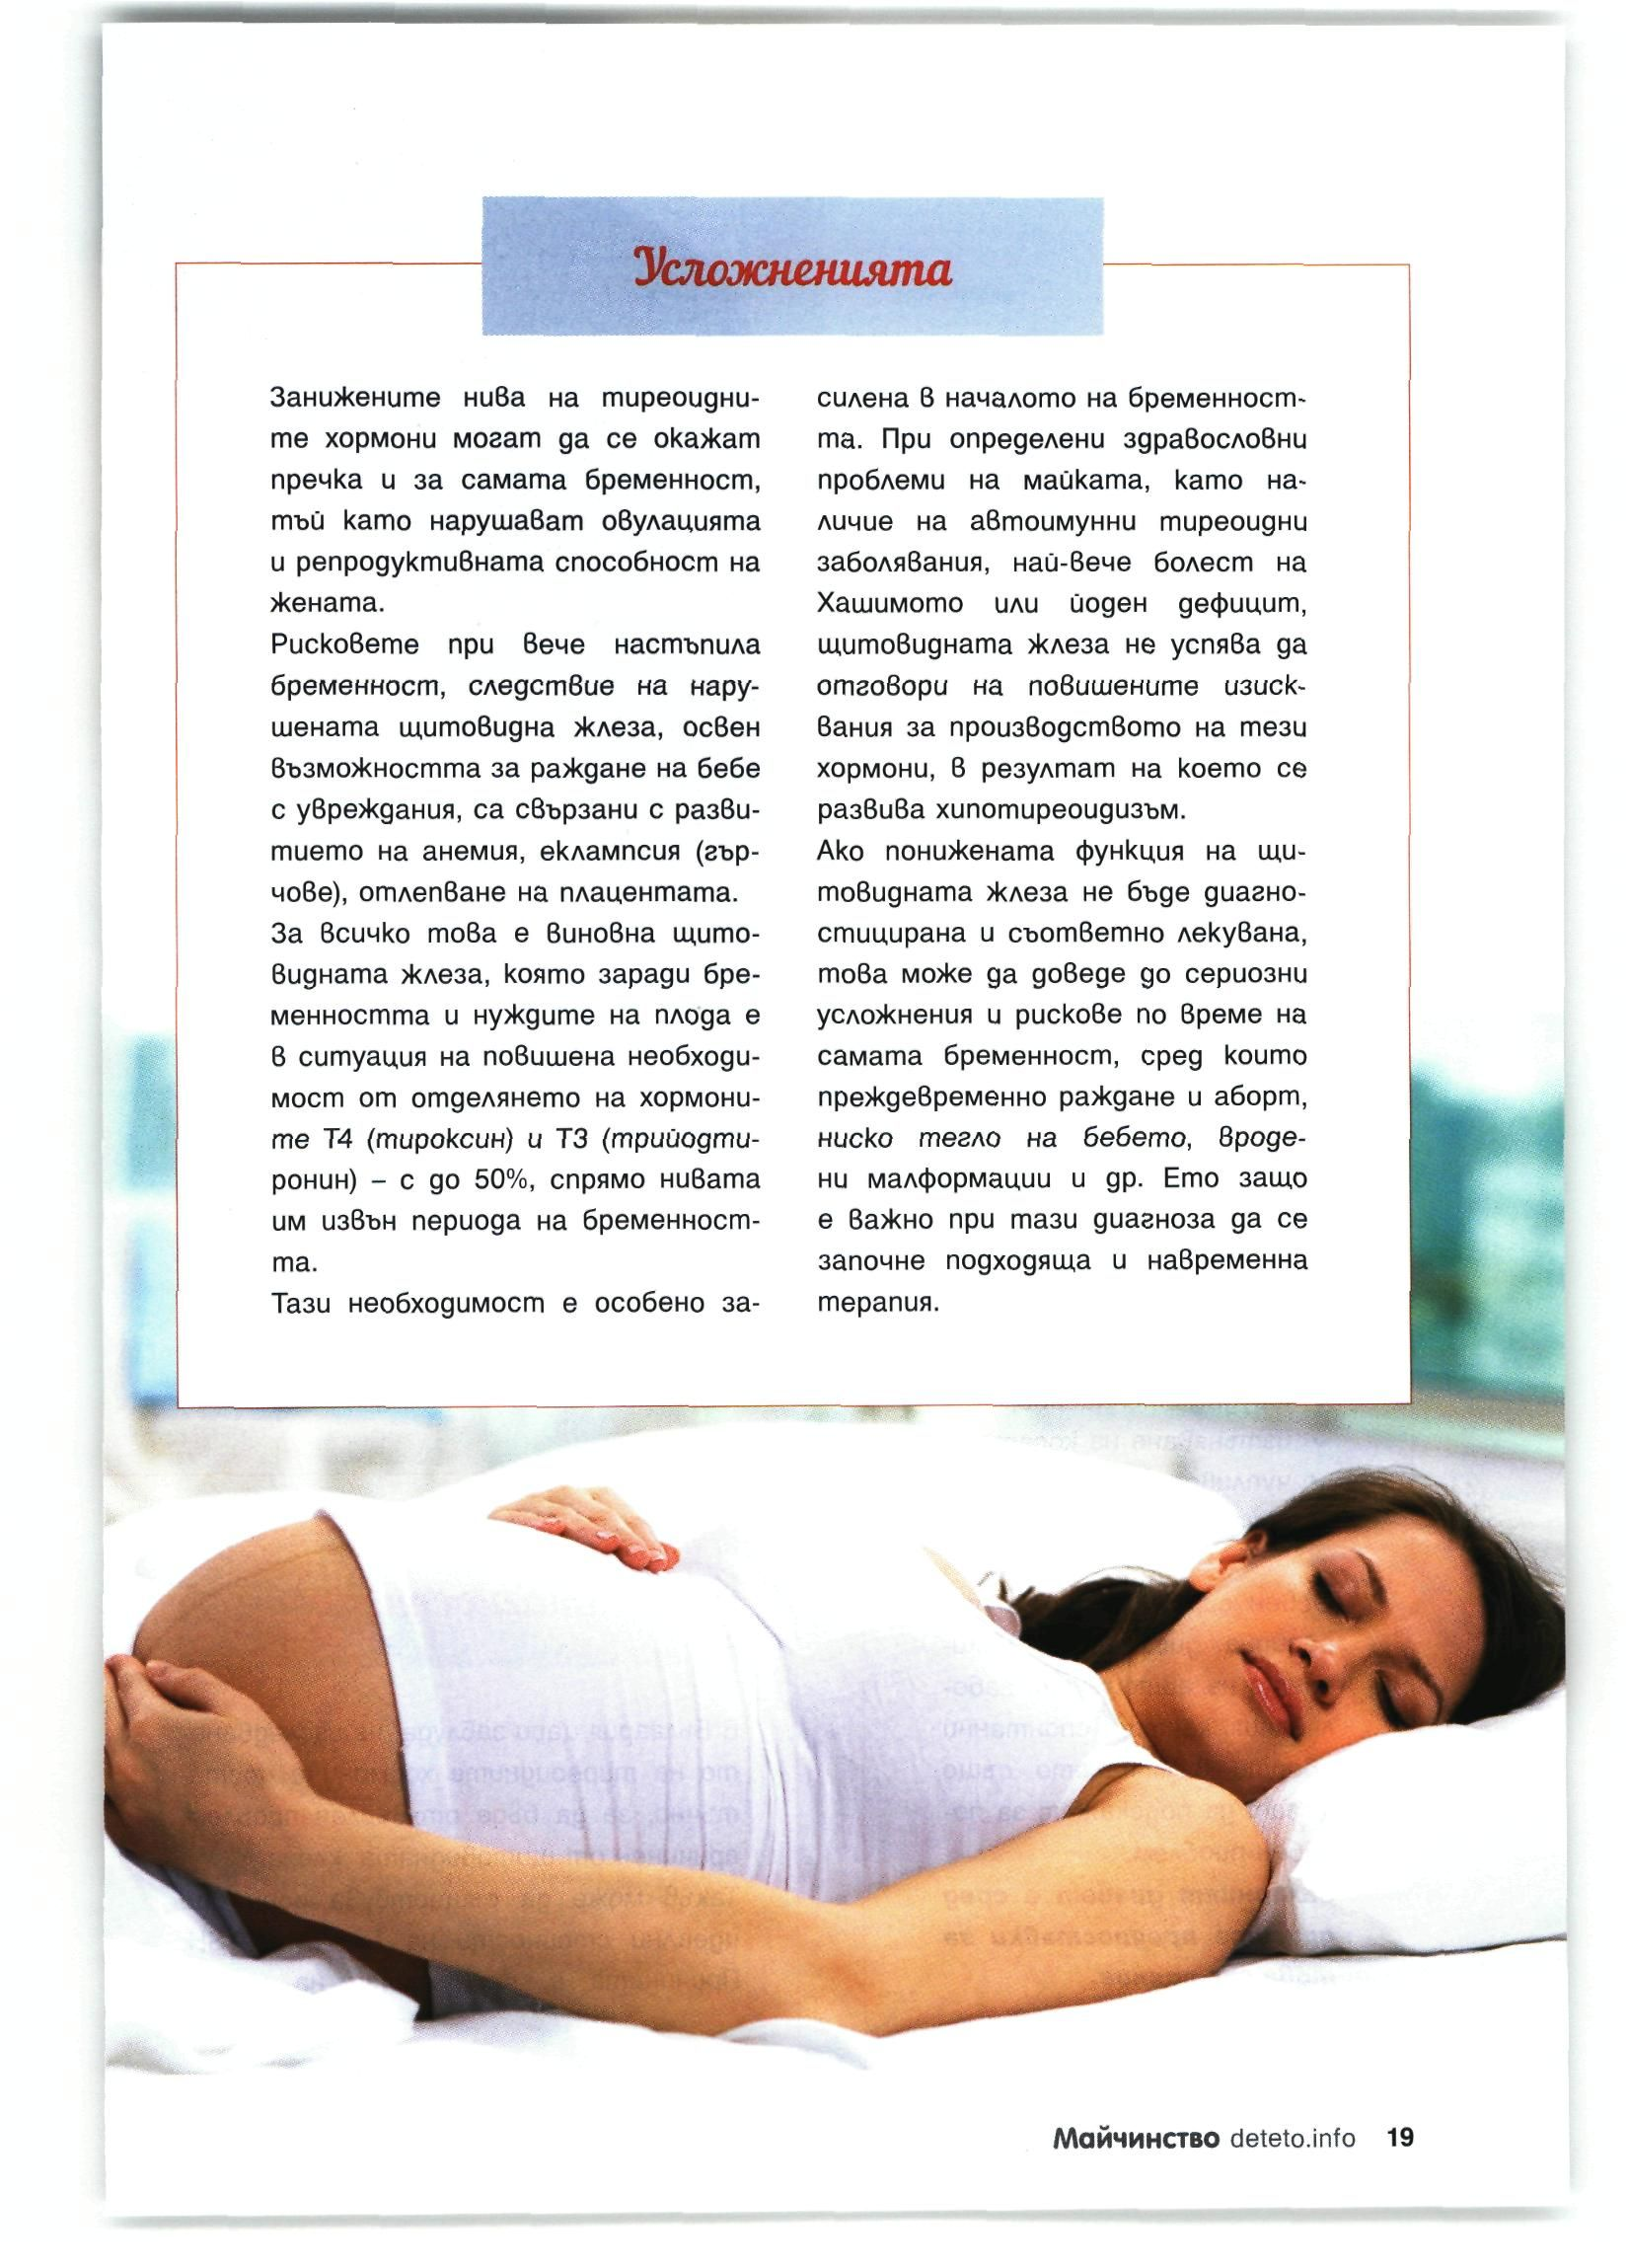 Играе критична роля по време на бременност